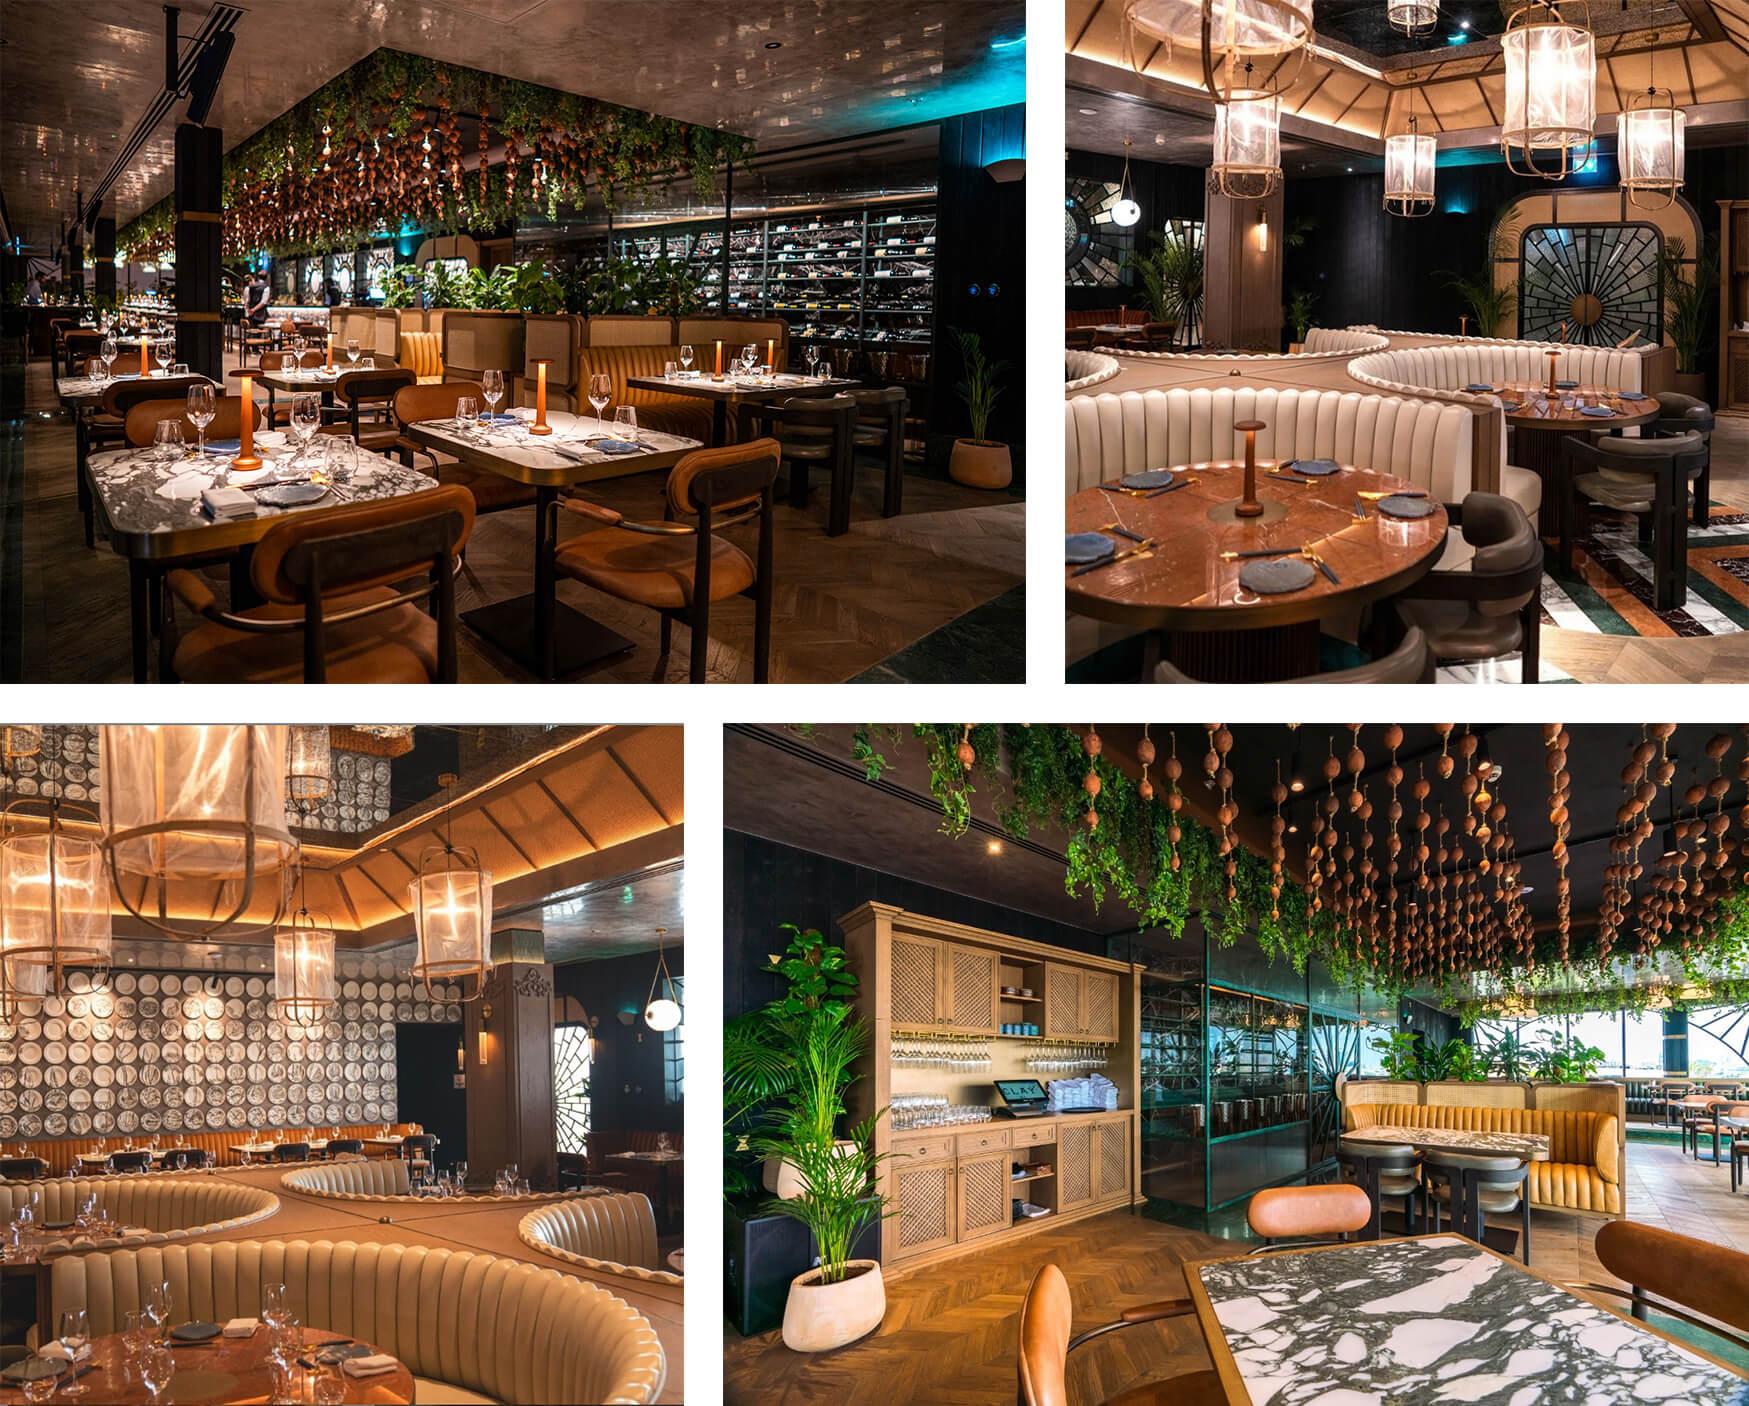 Photos of a Gorgeous Restaurant Design